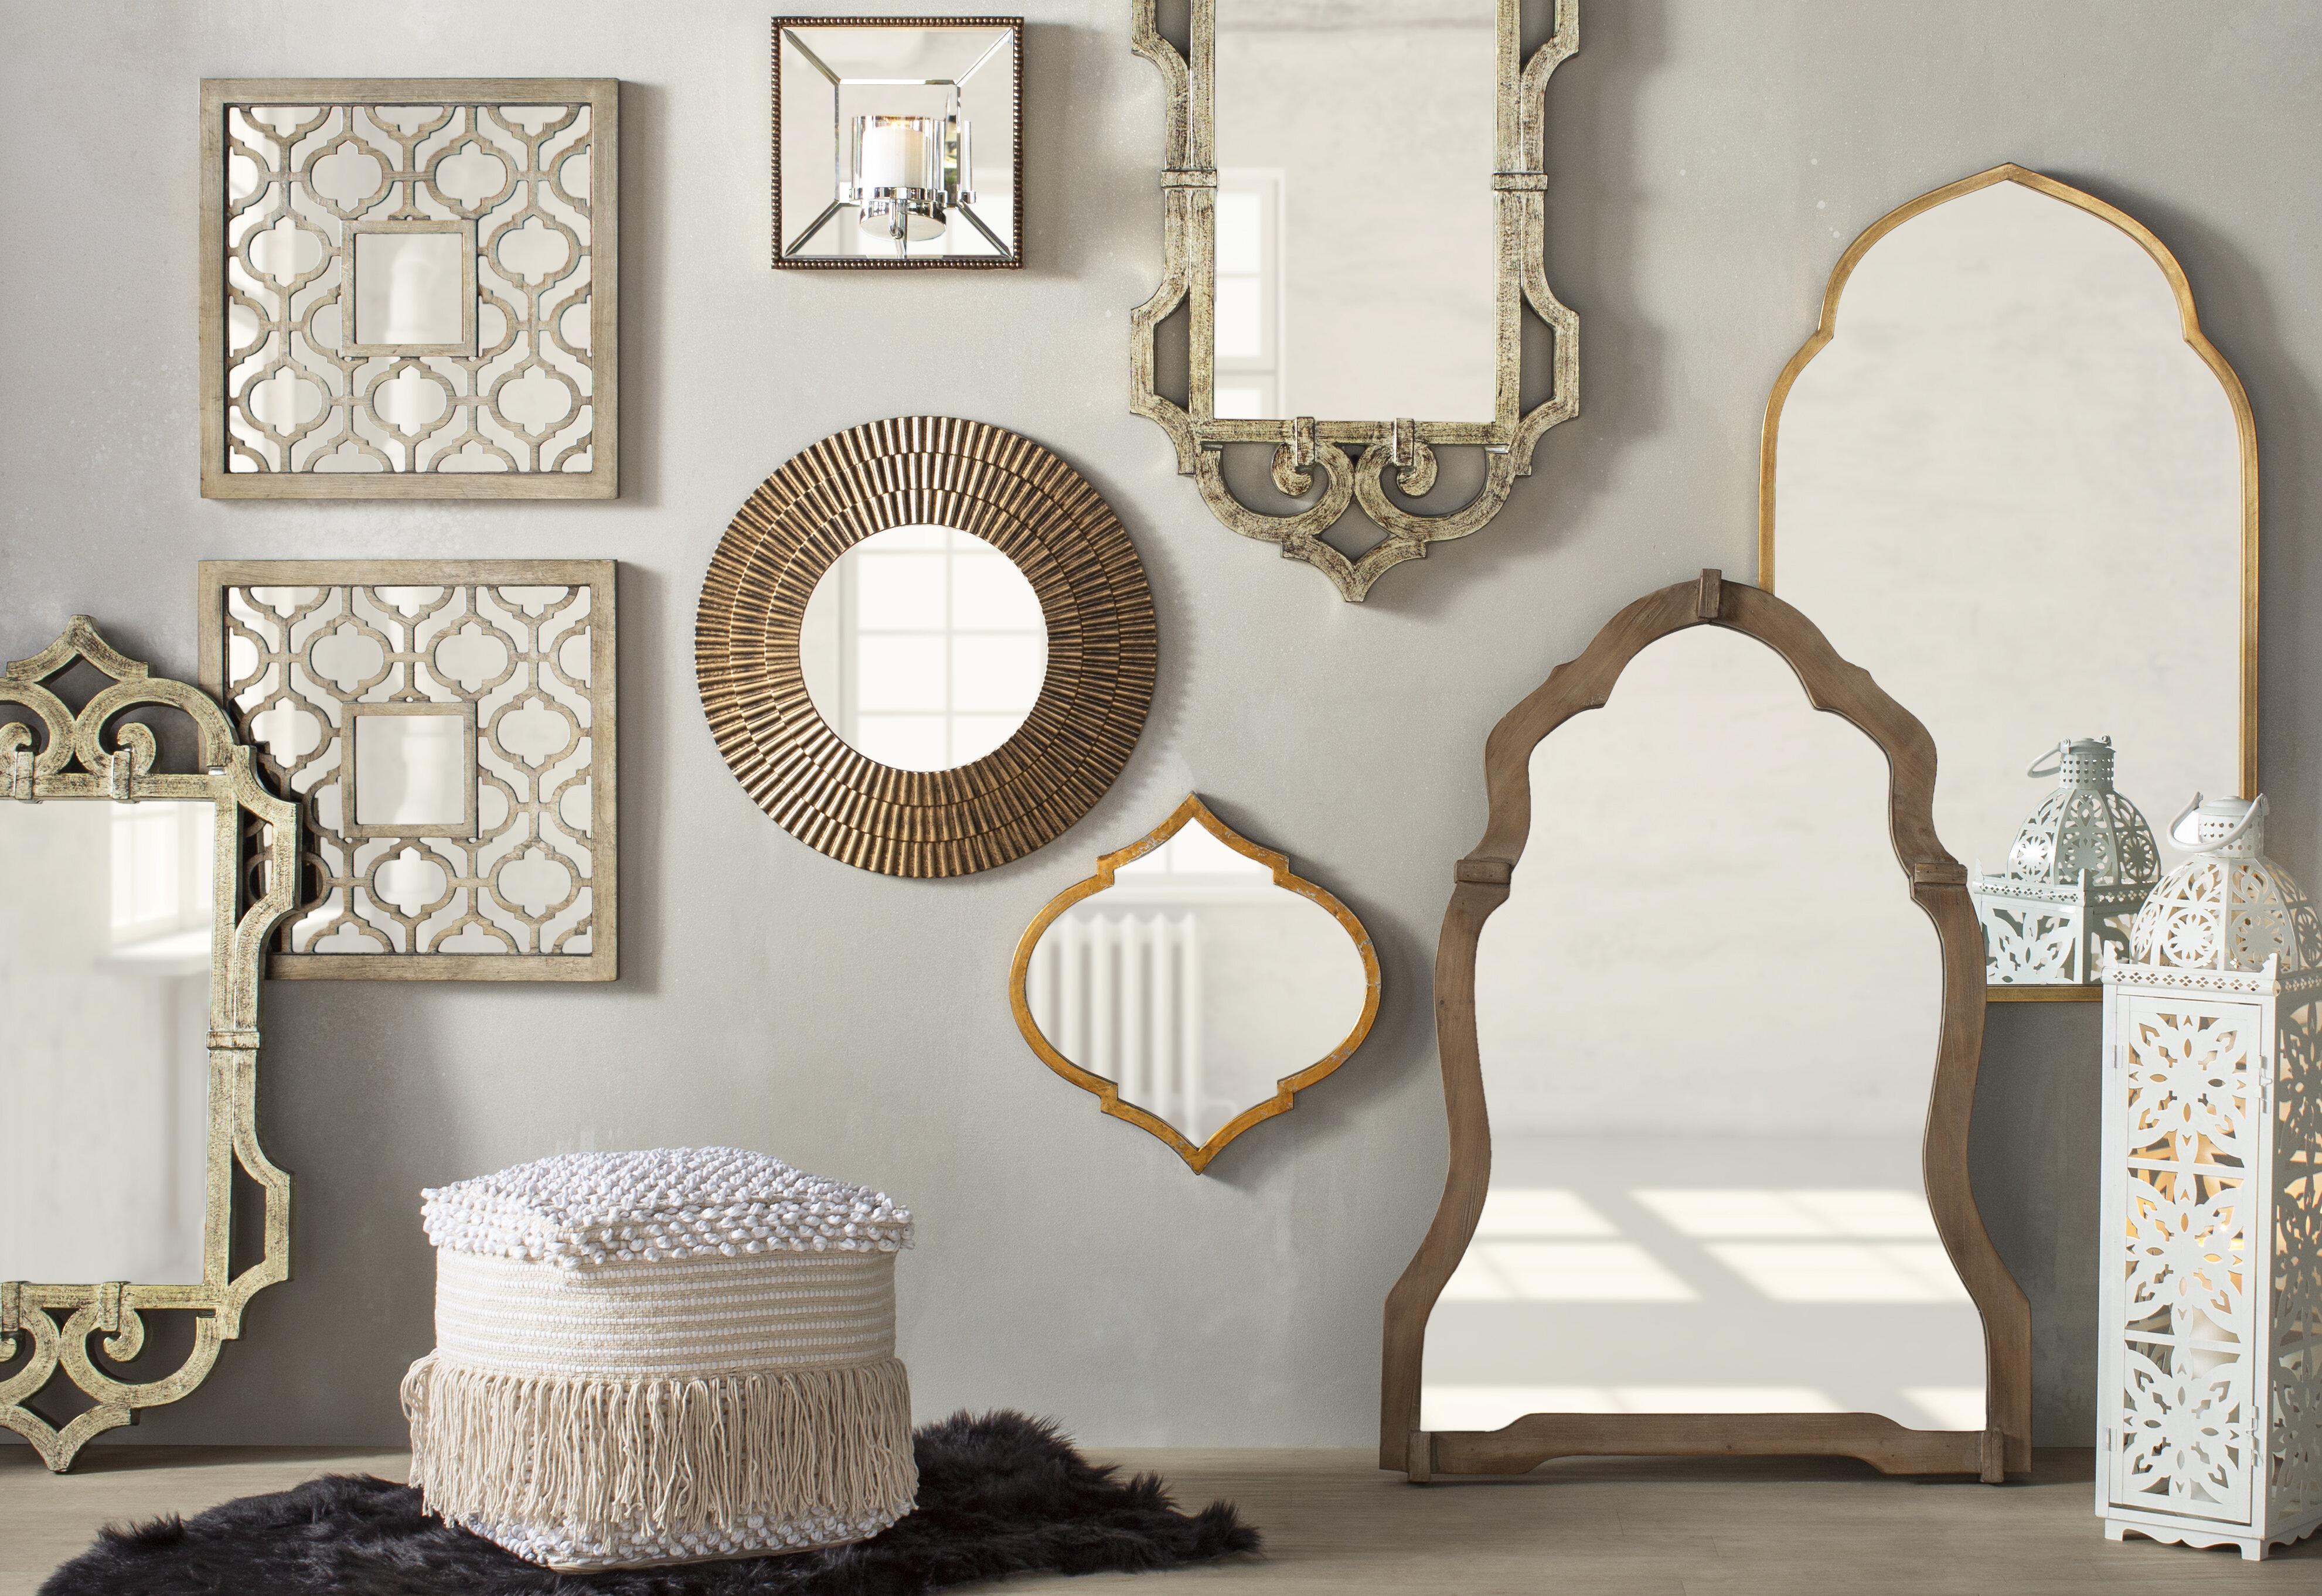 10 Dazzling Wall Mirror Decor Ideas With Photos Wayfair